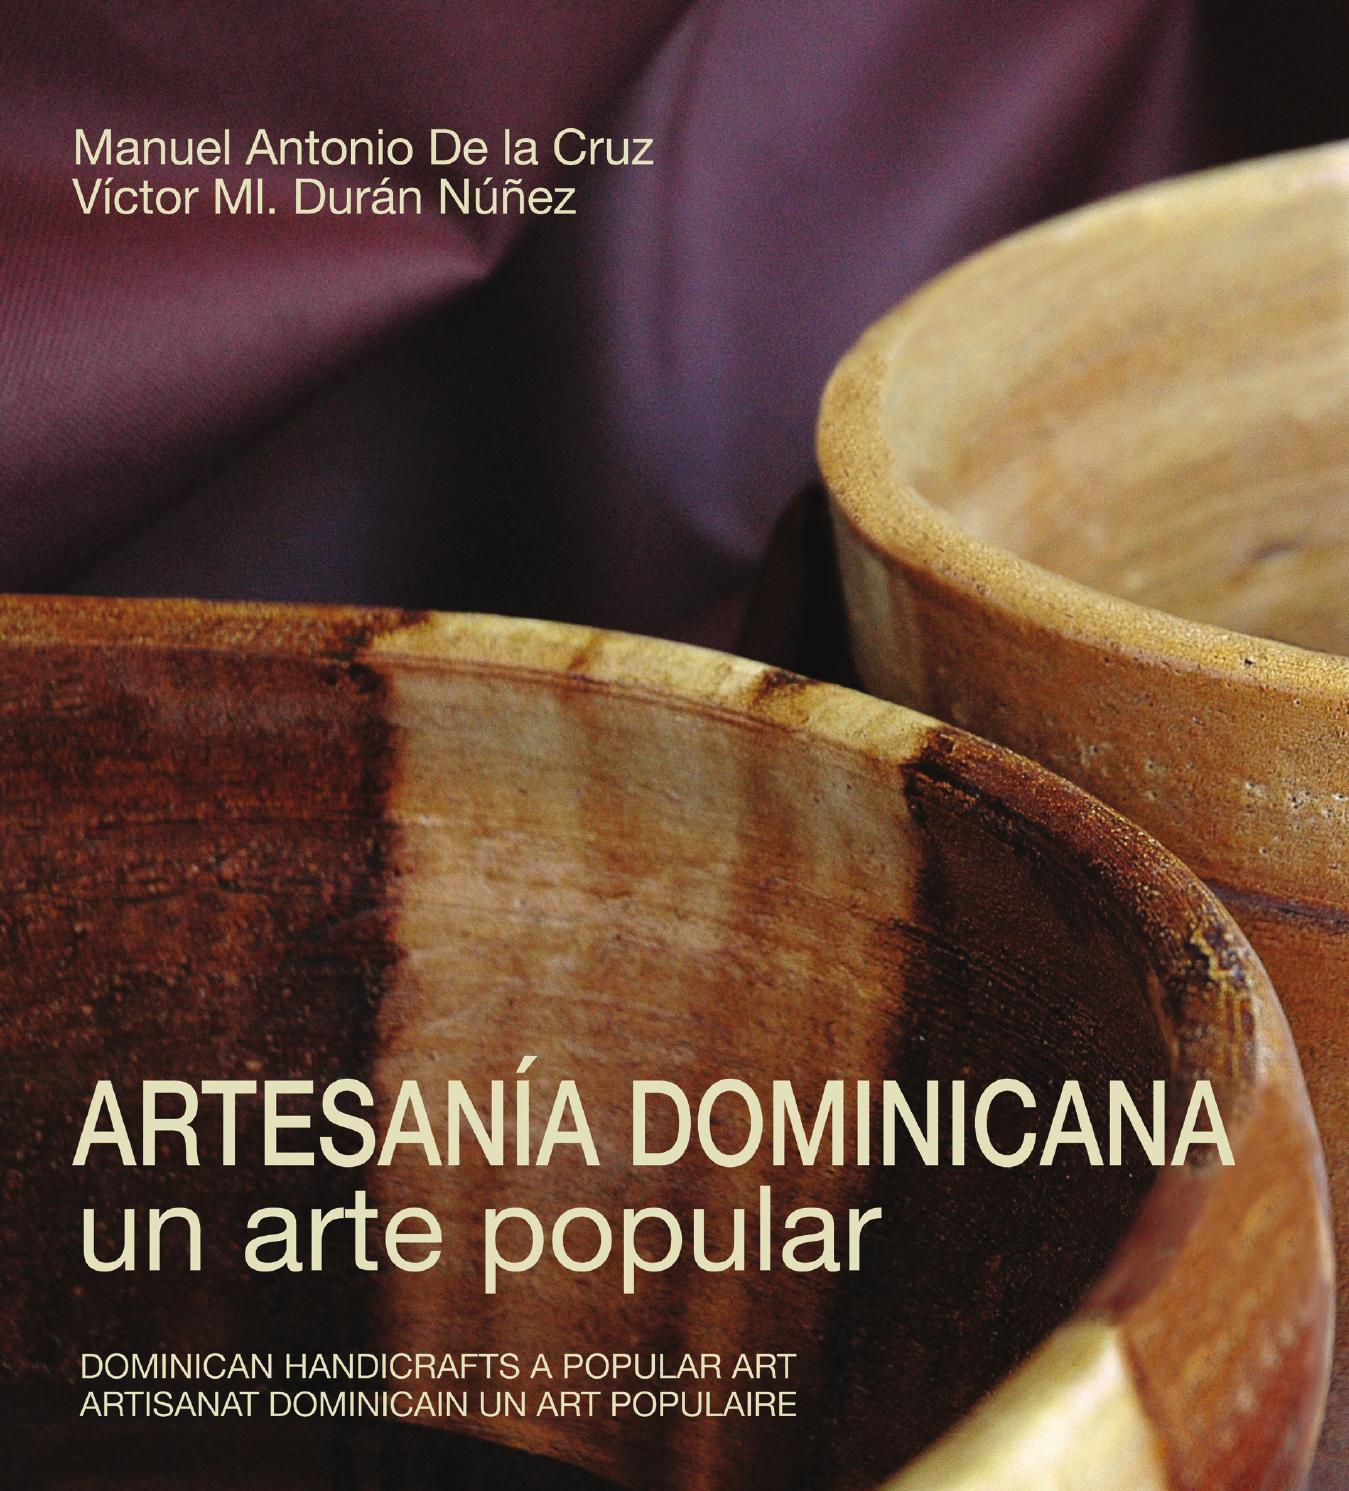 Artesanato Mdf Kit Higiene ~ Artesanía Dominicana Un arte popular by Banco Popular Dominicano Issuu